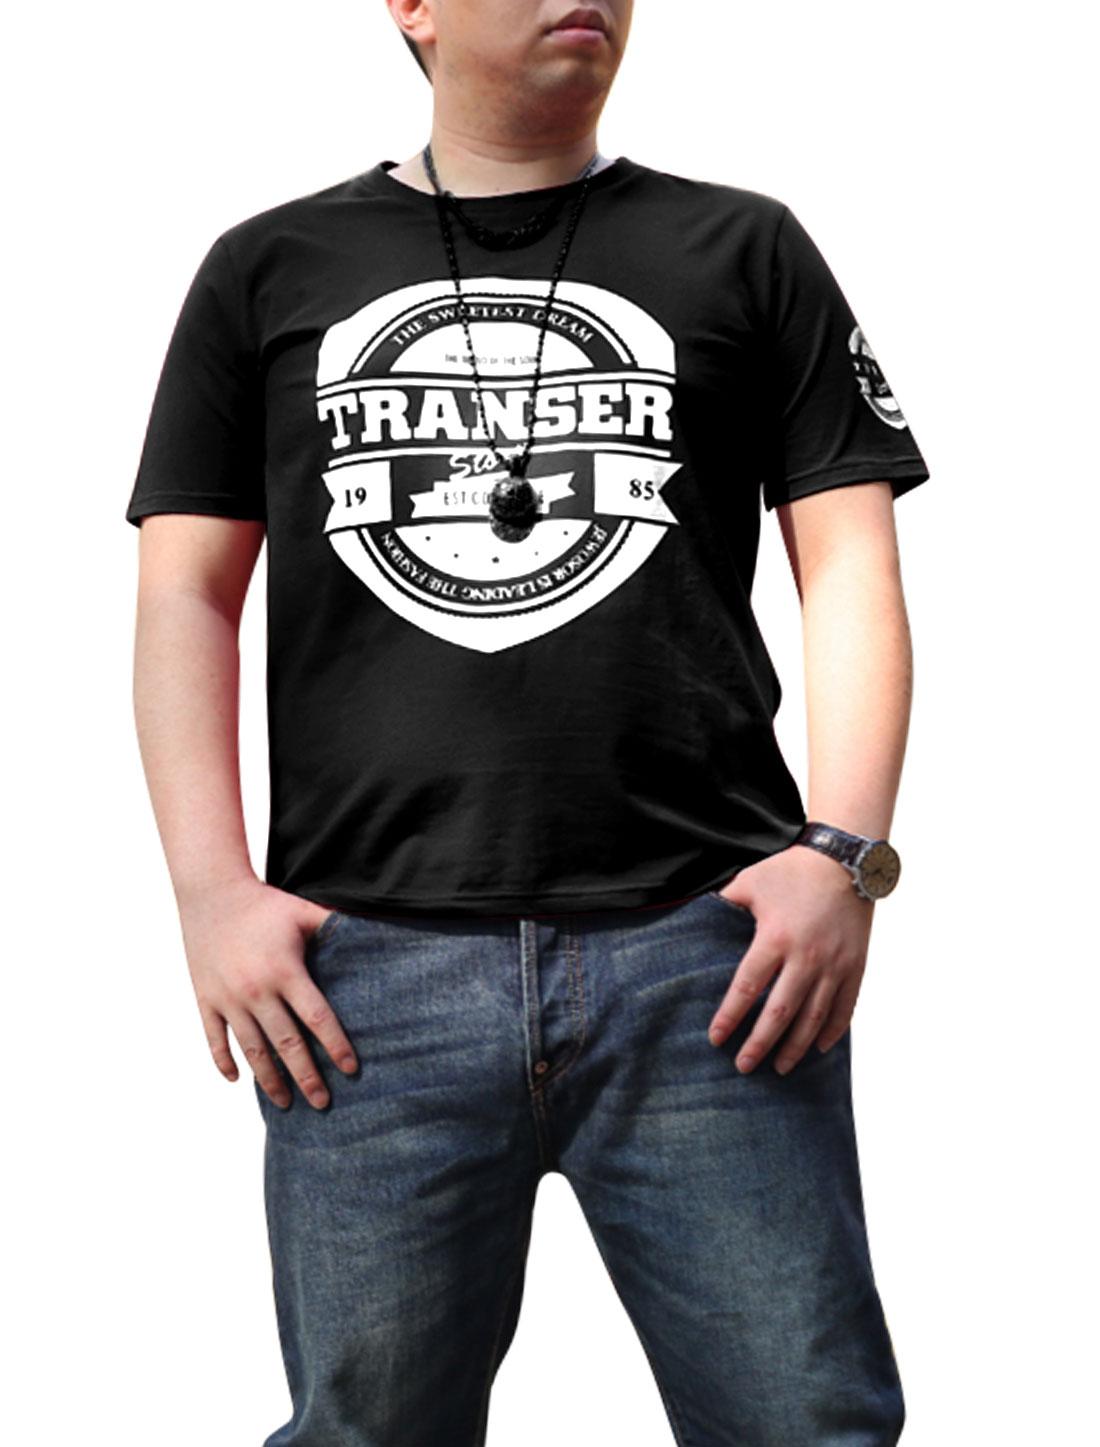 Men Short Sleeves Letters Print Fashion Tee Shirt Black XL